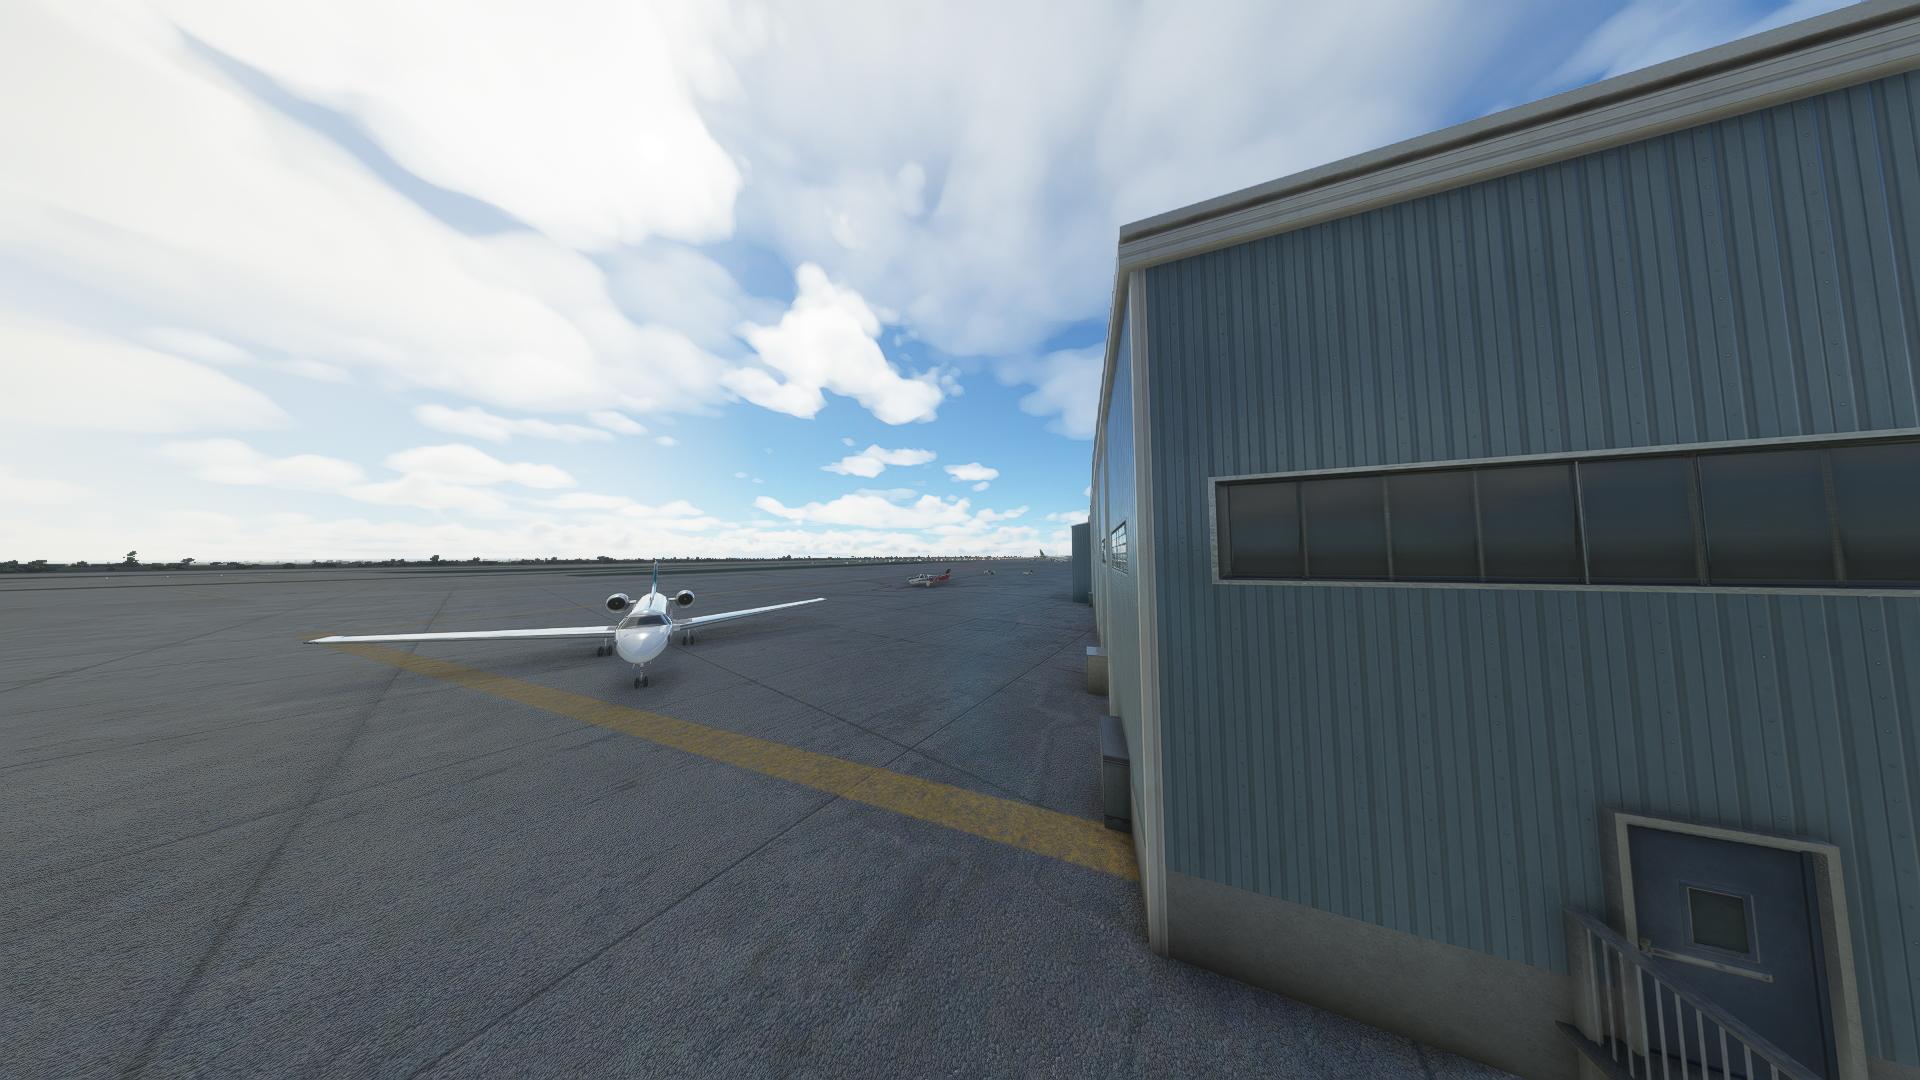 Microsoft Flight Simulator Rex Global Airport Textures 1